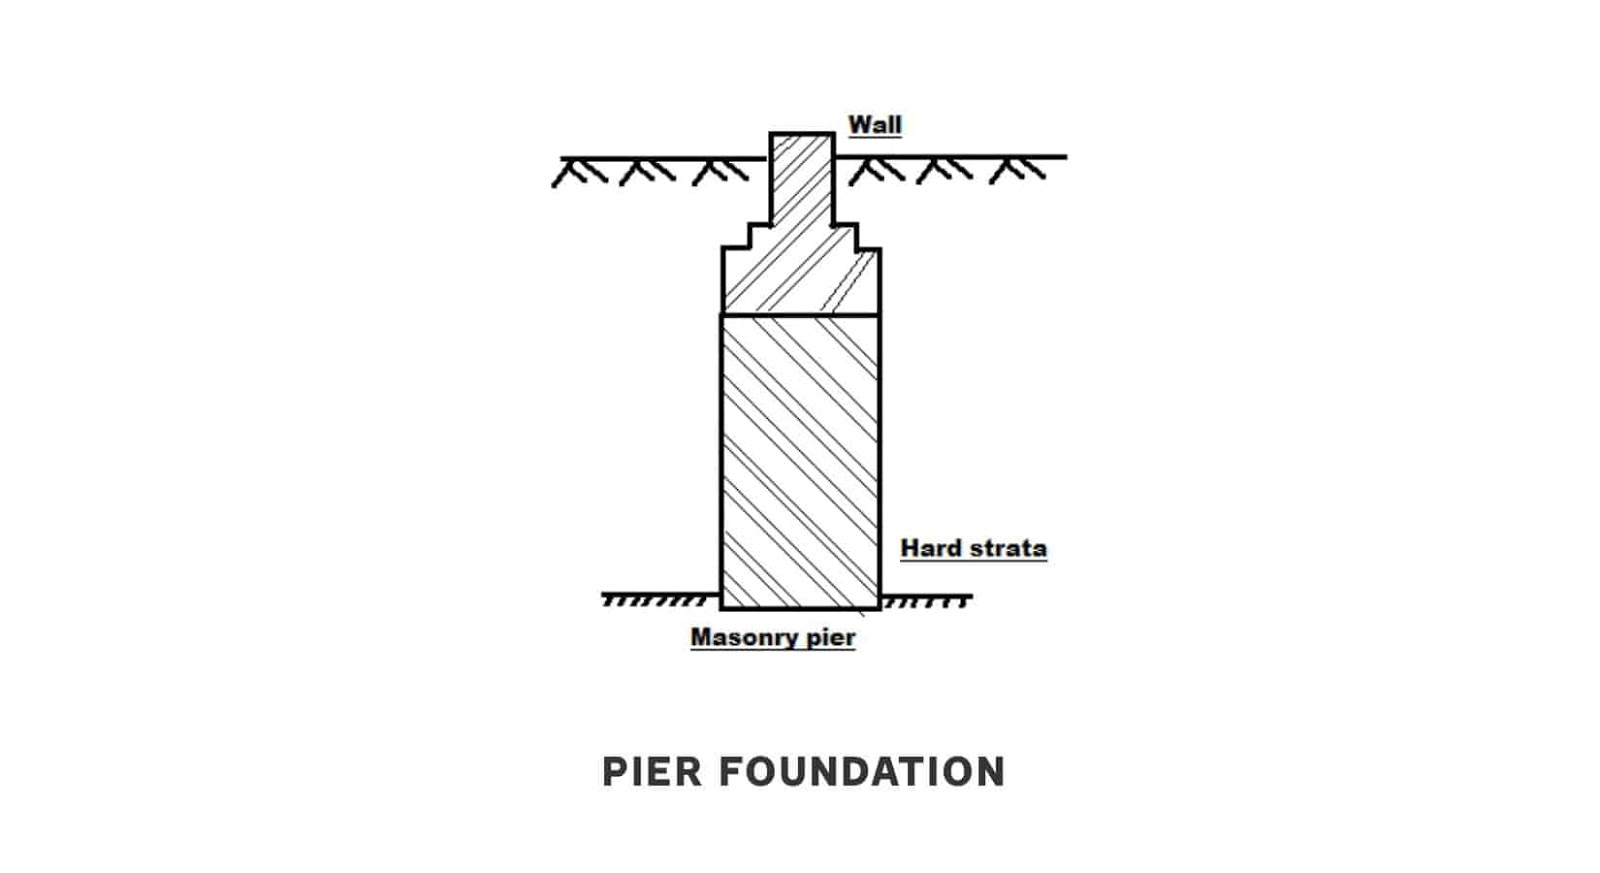 Pier foundation